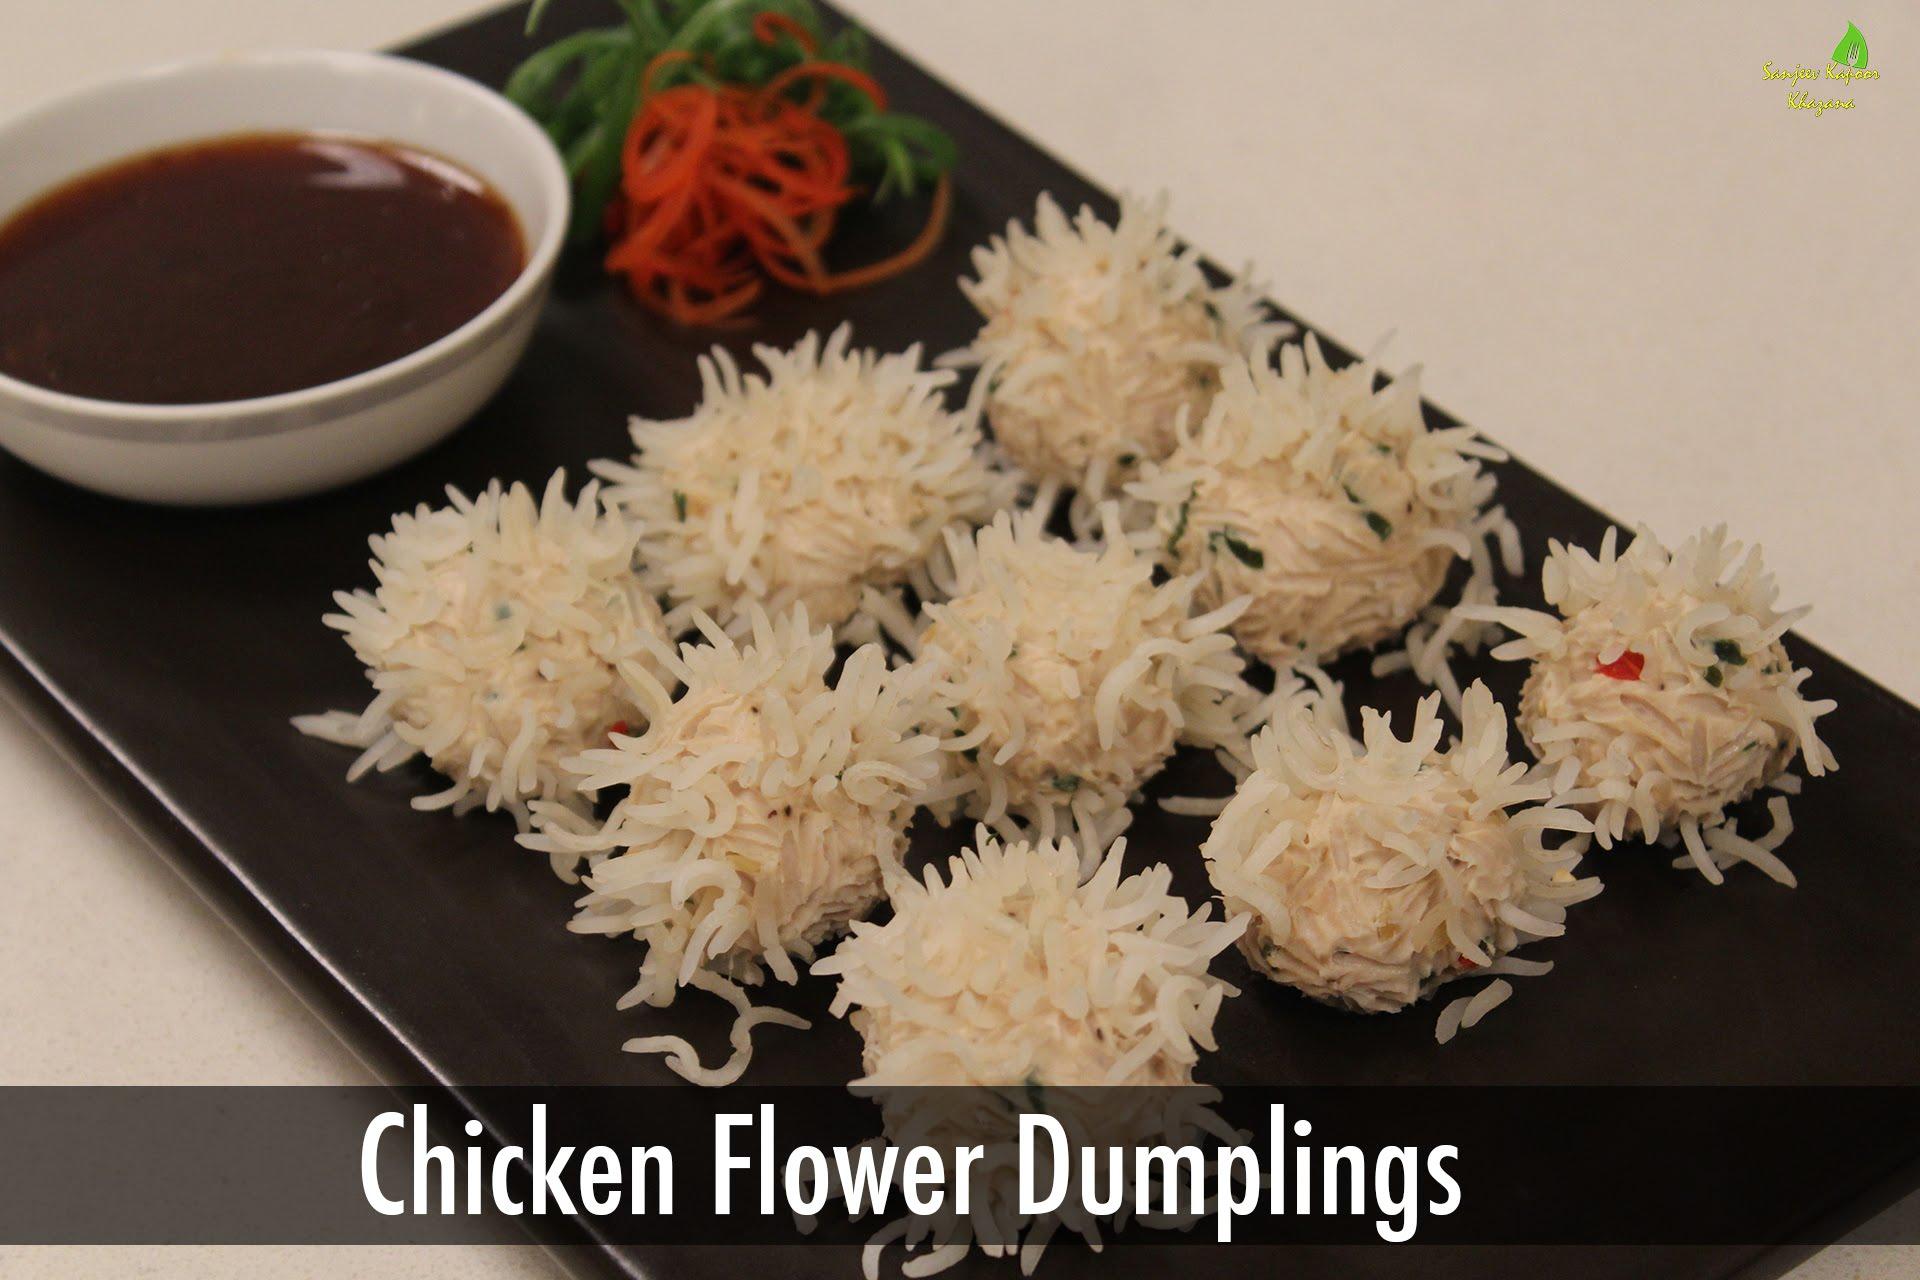 Chicken flower dumpling chinese recipes sanjeev kapoor khazana chicken flower dumpling chinese recipes sanjeev kapoor khazana cookeryshow forumfinder Gallery